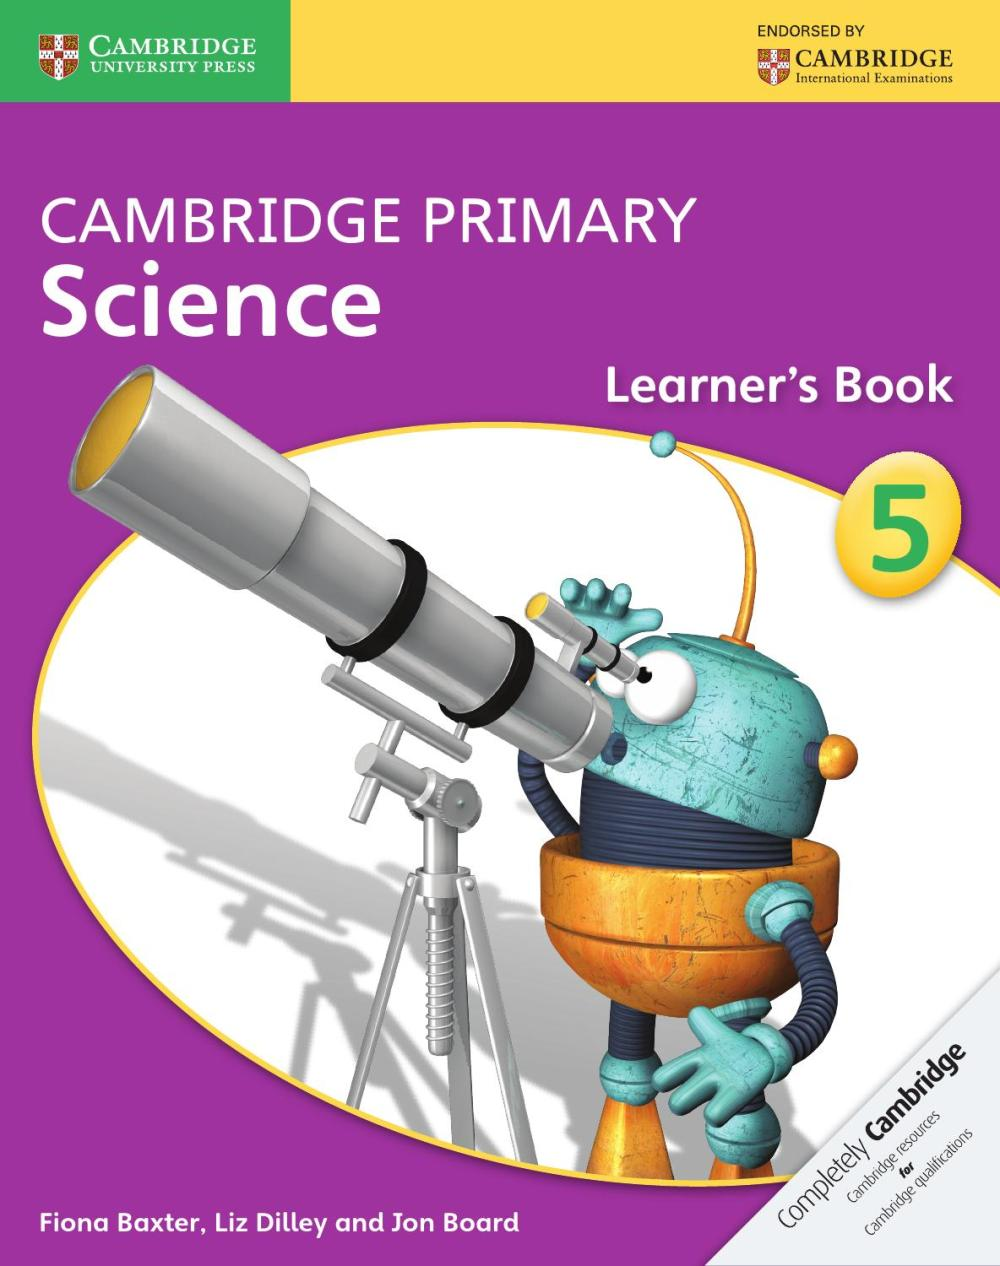 medium resolution of Cambridge Primary Science Learner's Book 5 by Cambridge University Press  Education - issuu